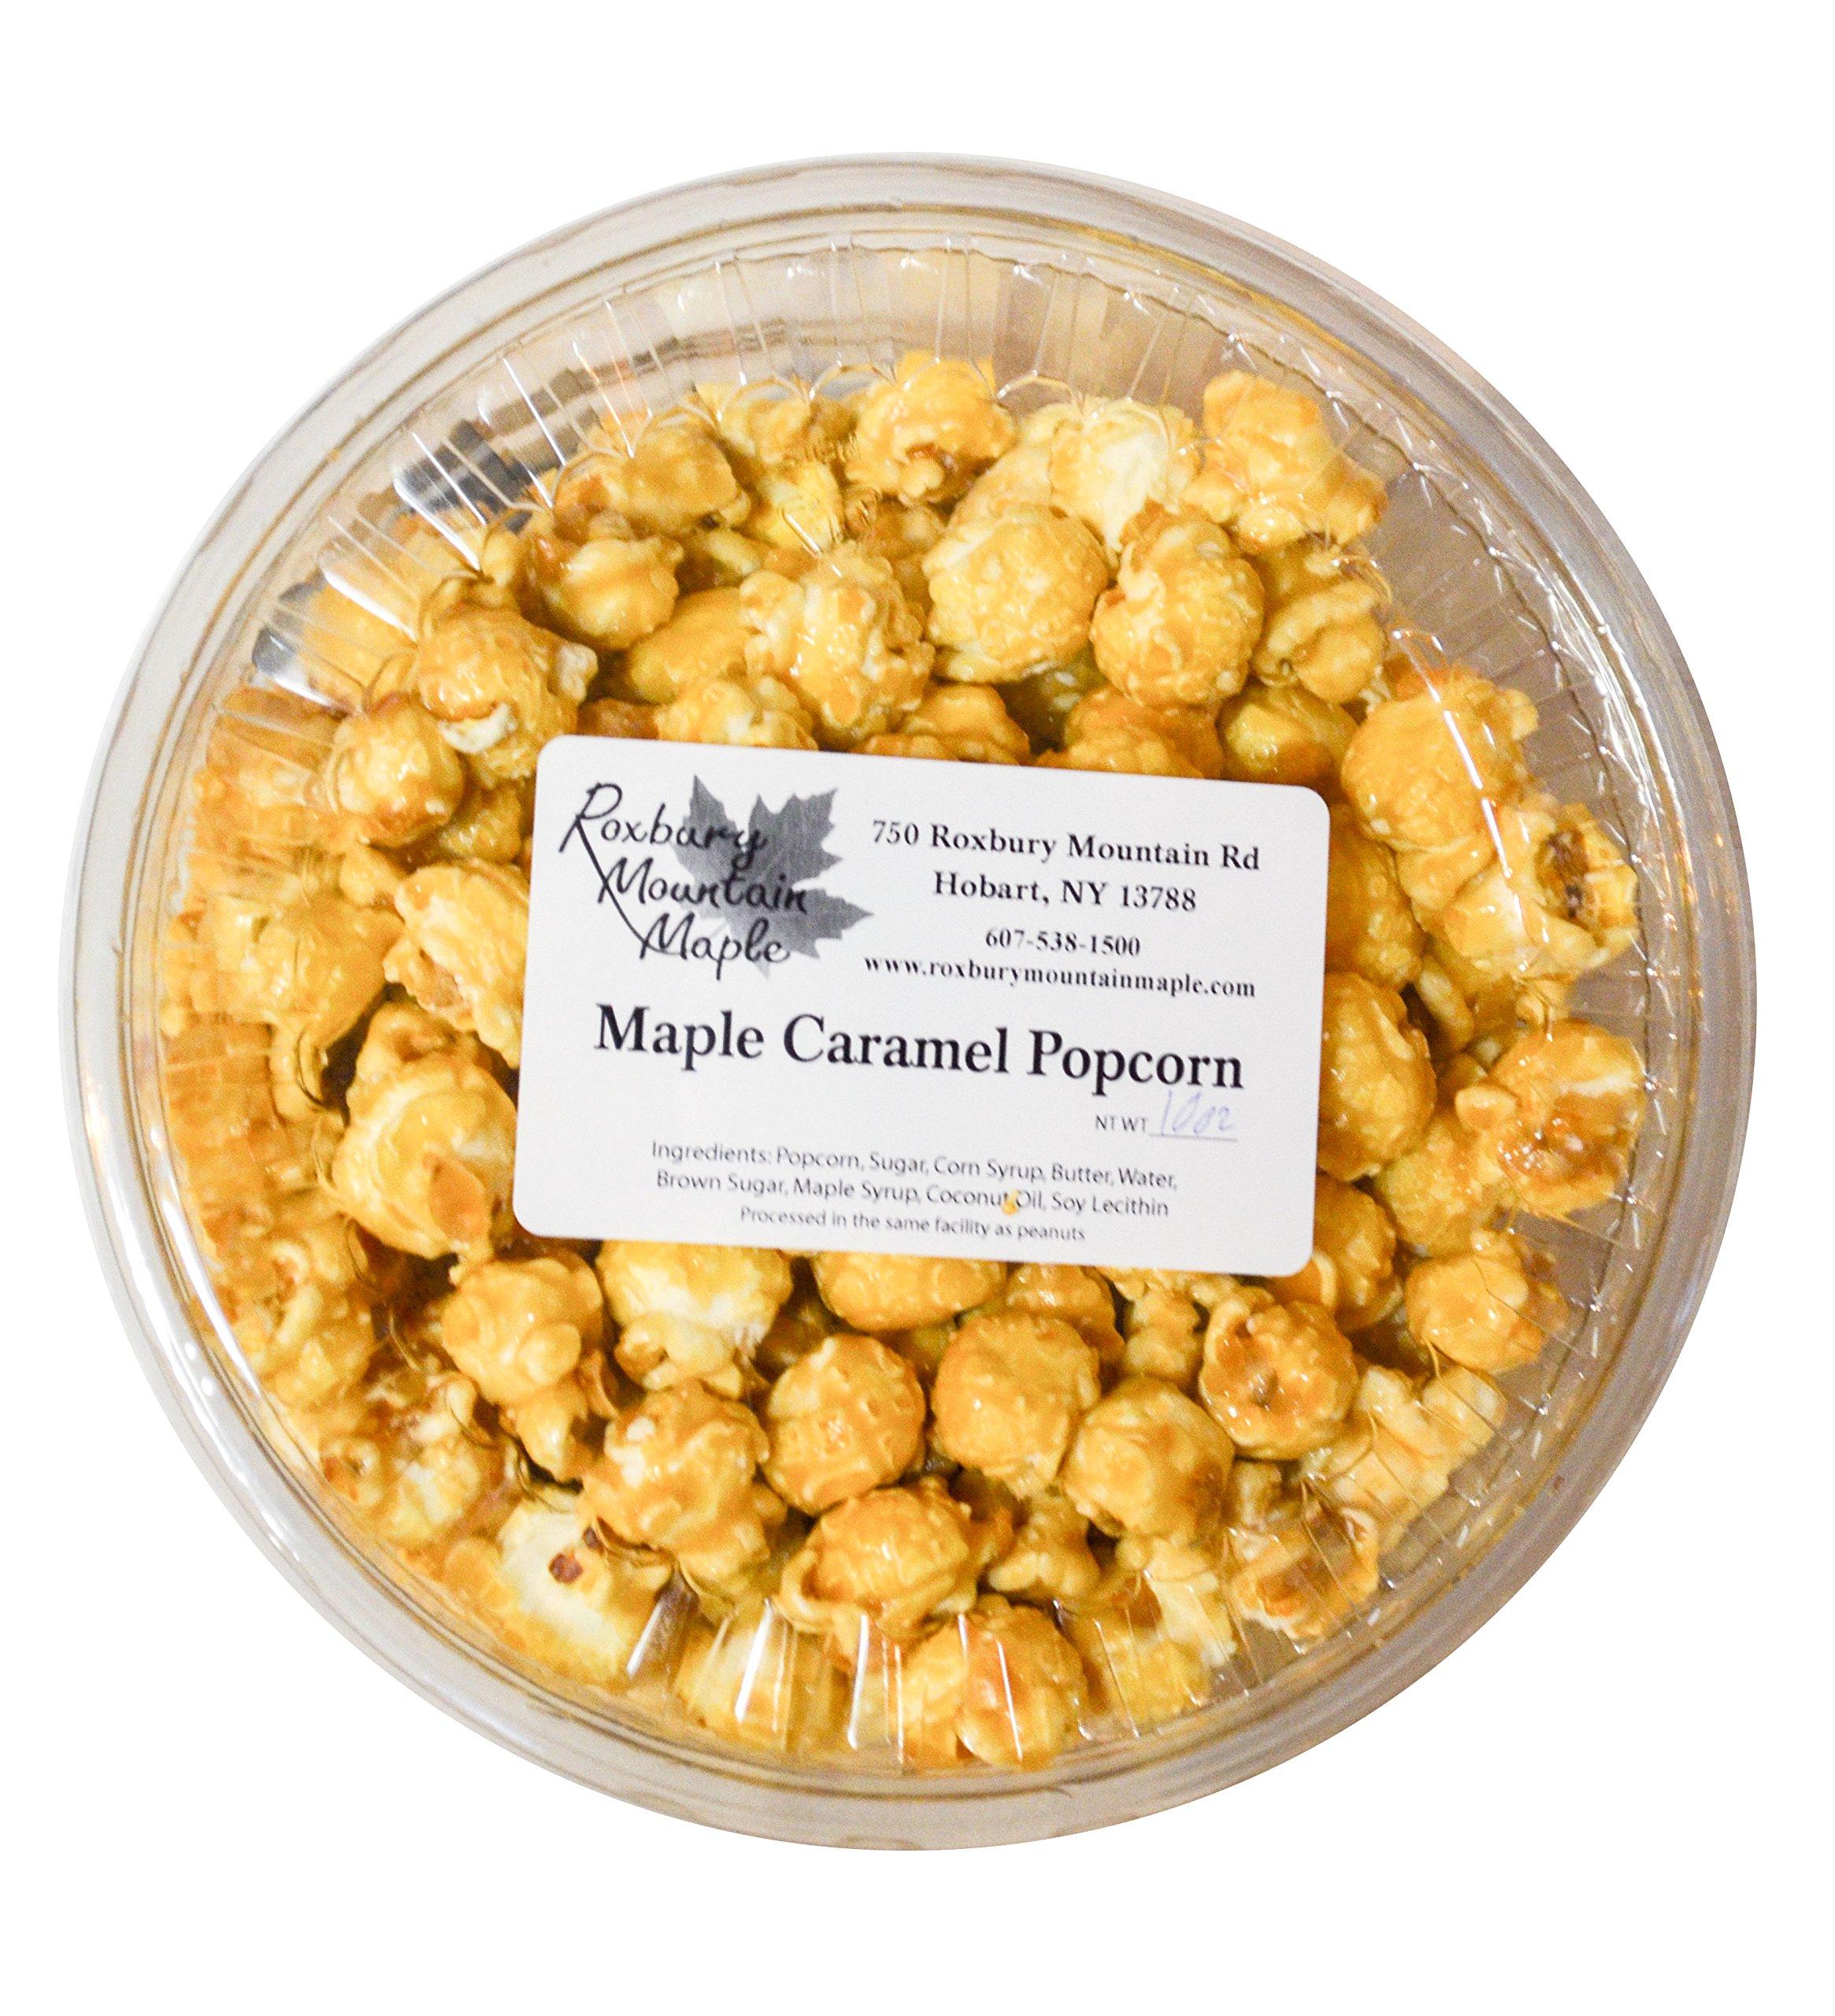 Maple Caramel Popcorn, Roxbury Mountain Maple, 10 Oz